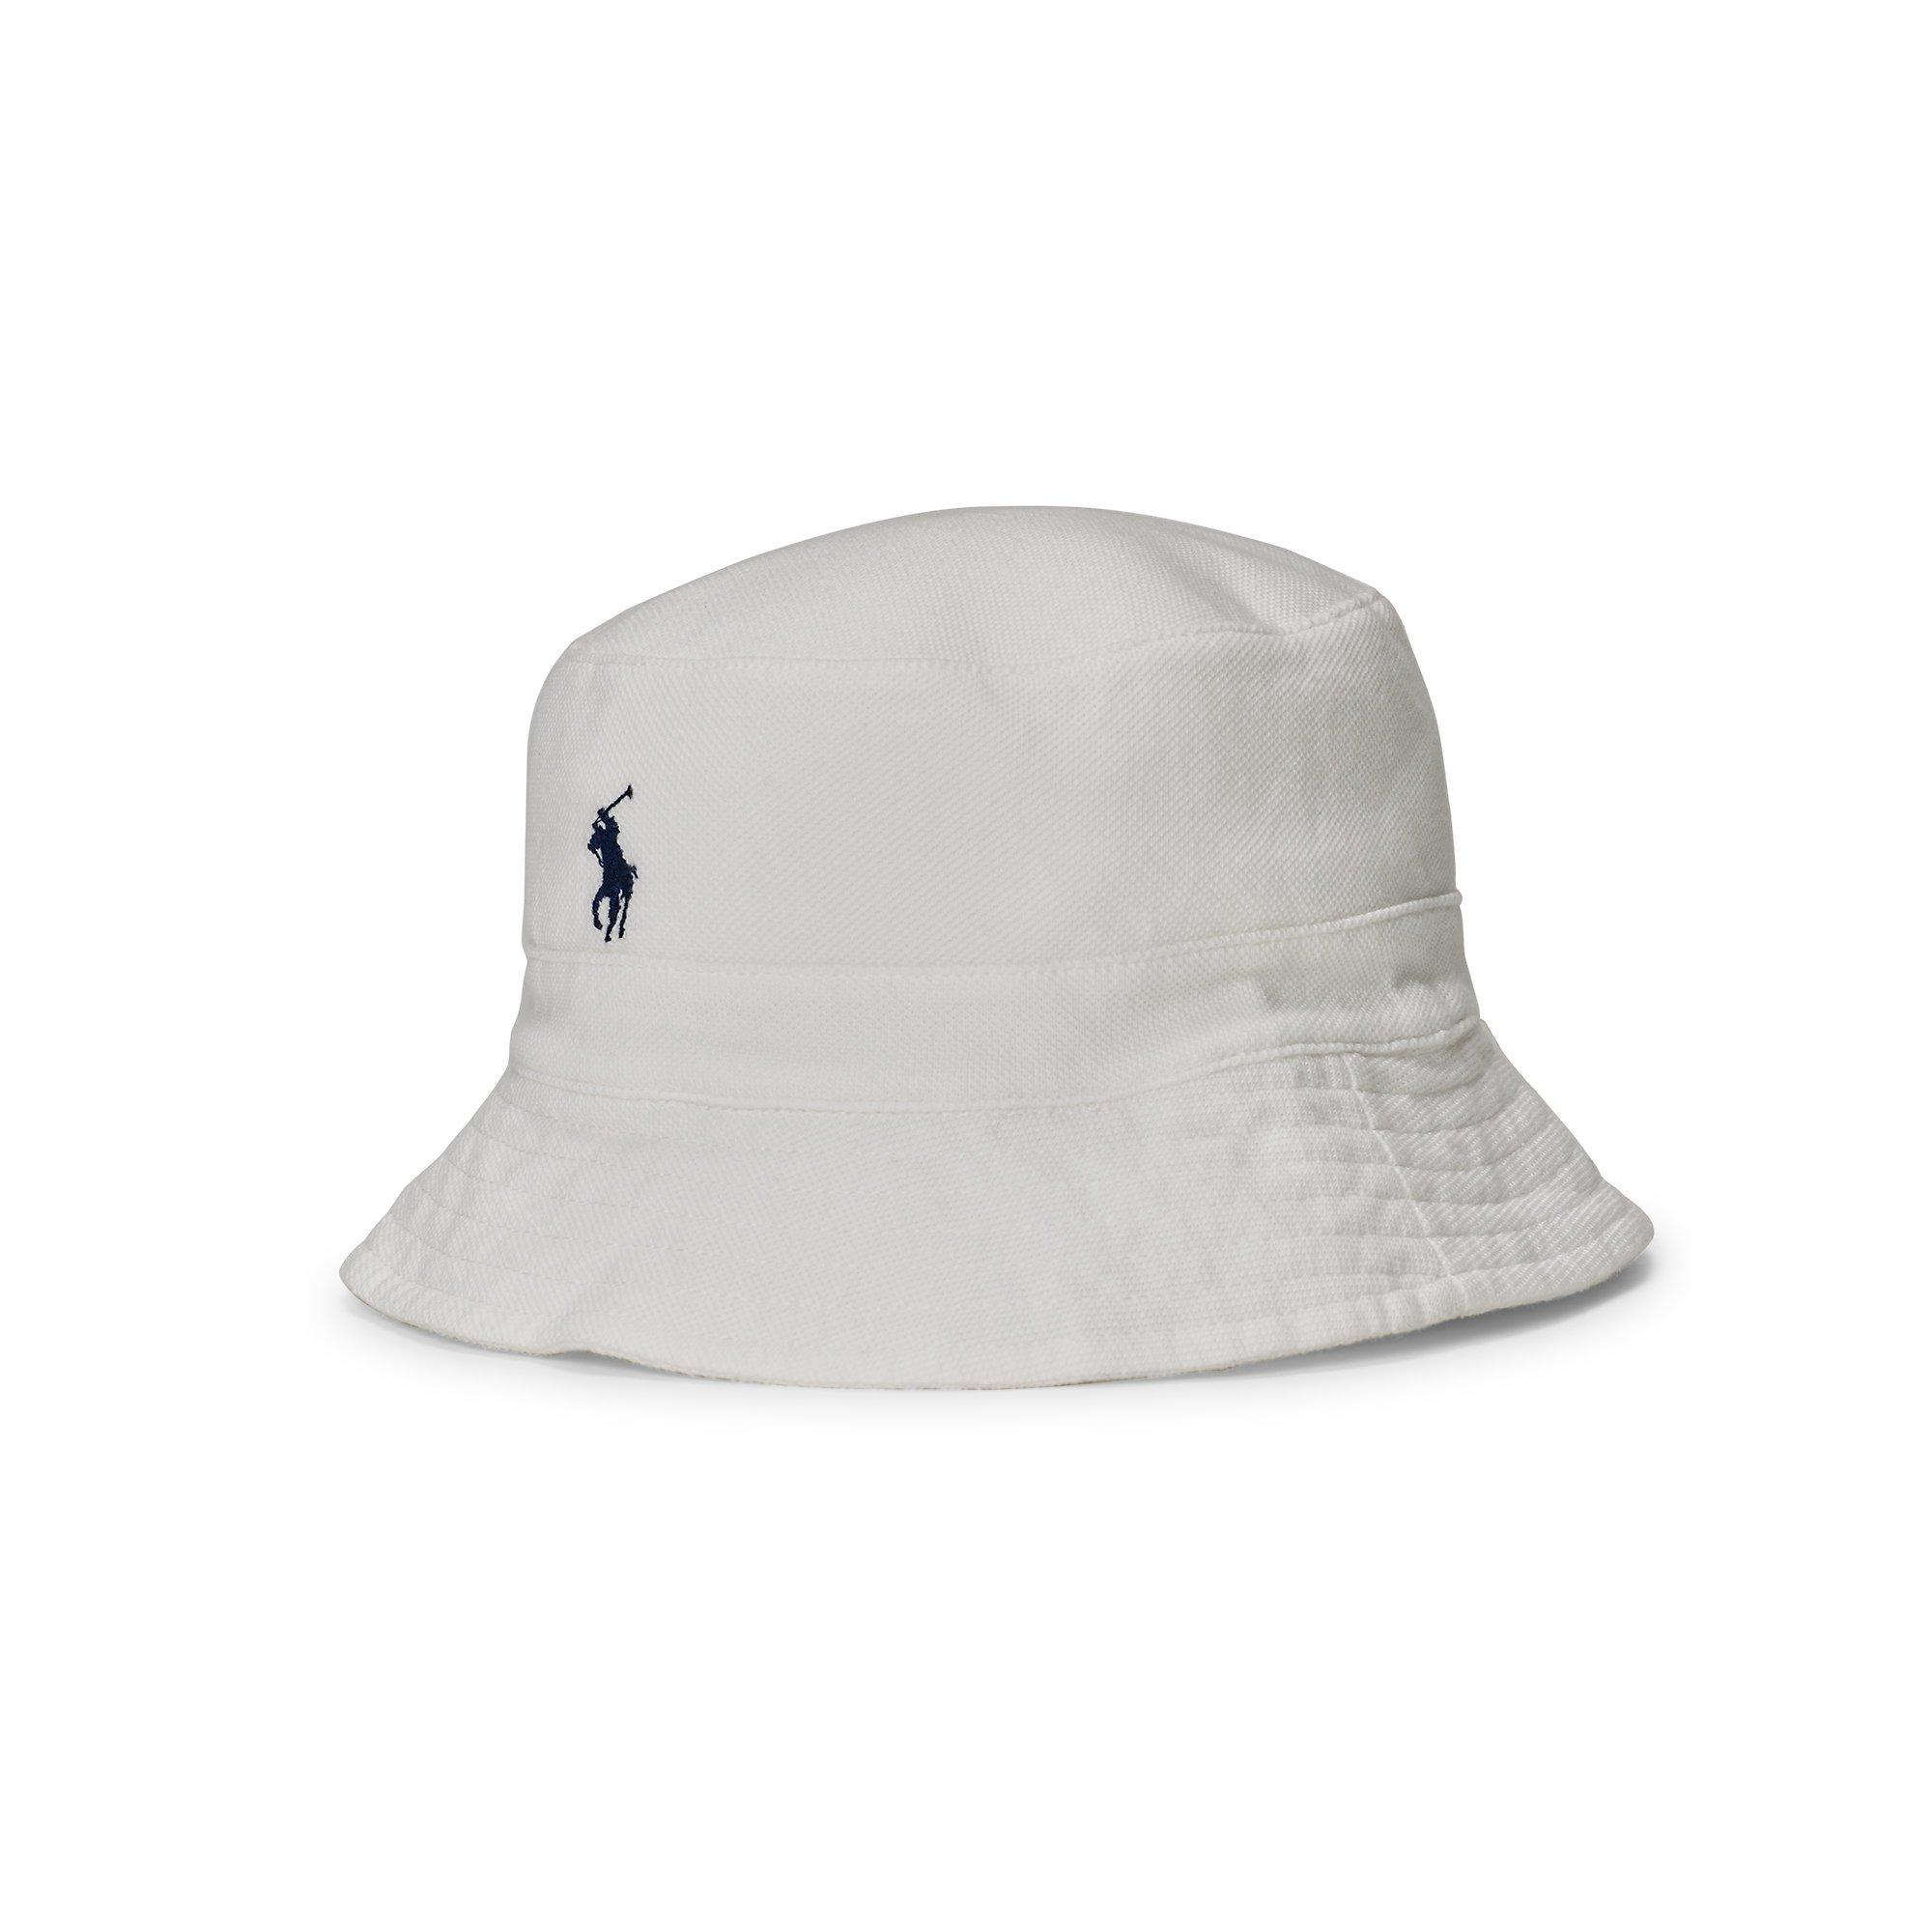 b200aa4fdc826 Polo Ralph Lauren Cotton Mesh Bucket Hat in White for Men - Lyst